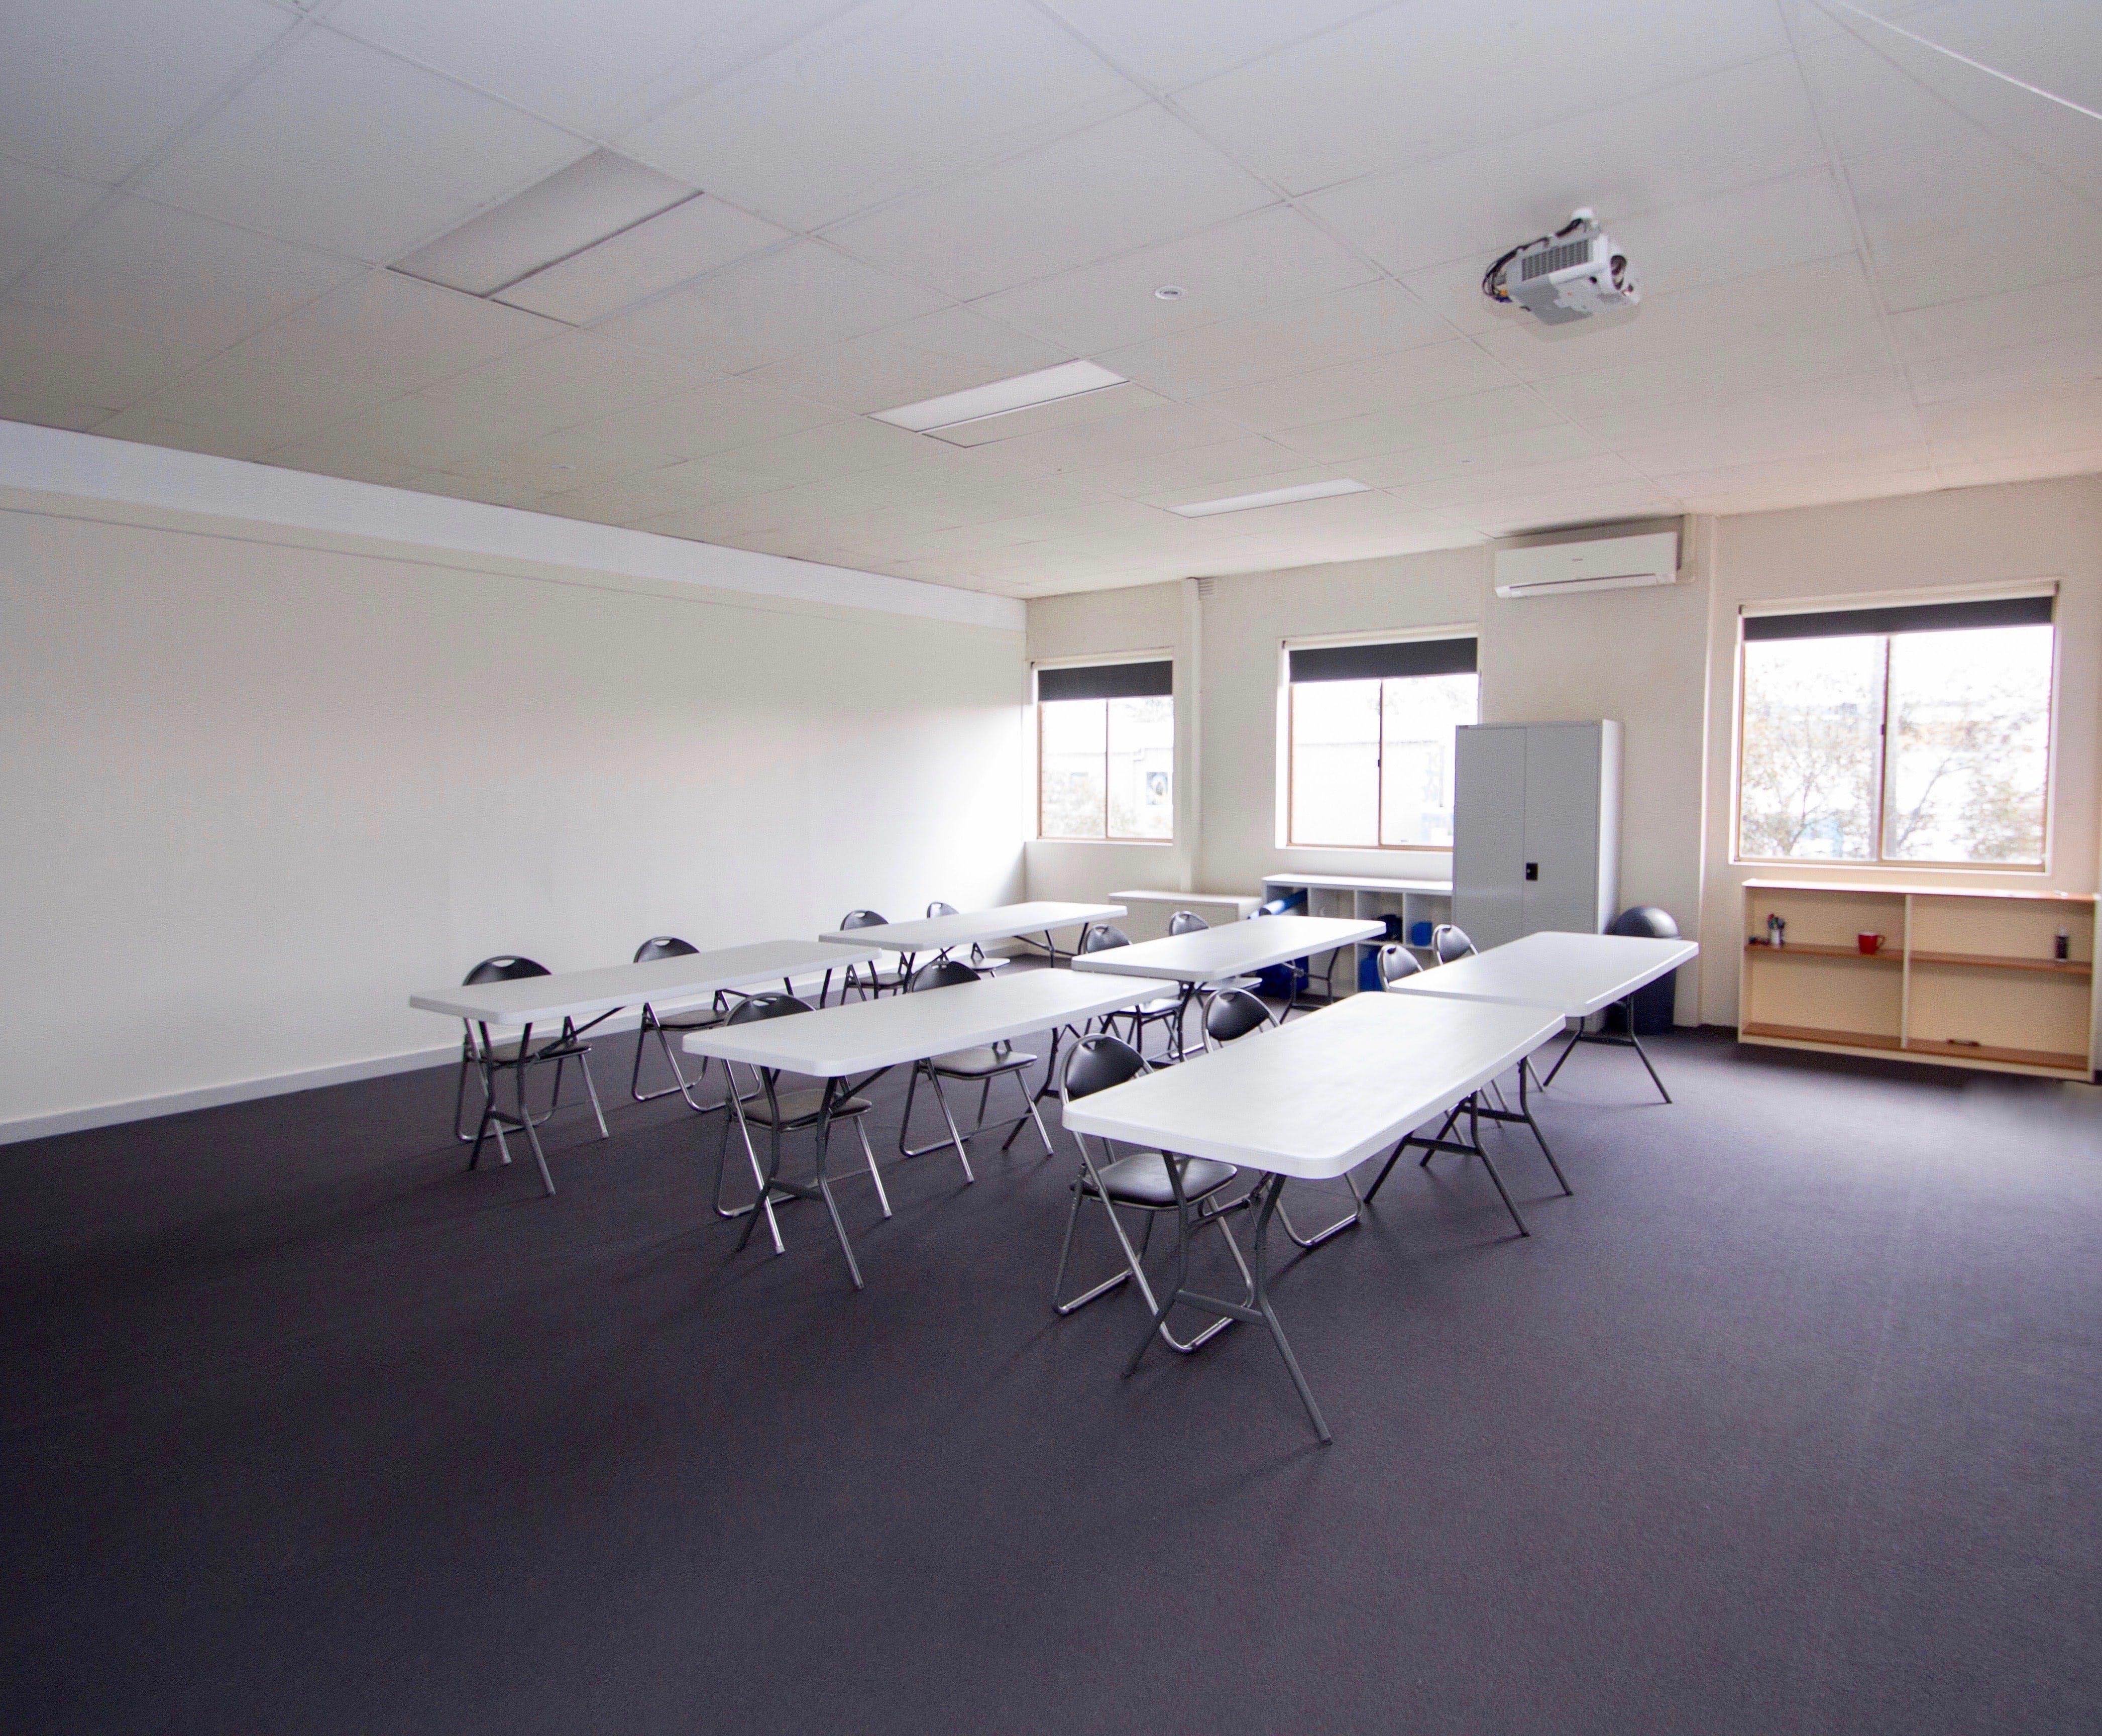 Training room at Manufactory Community, image 1